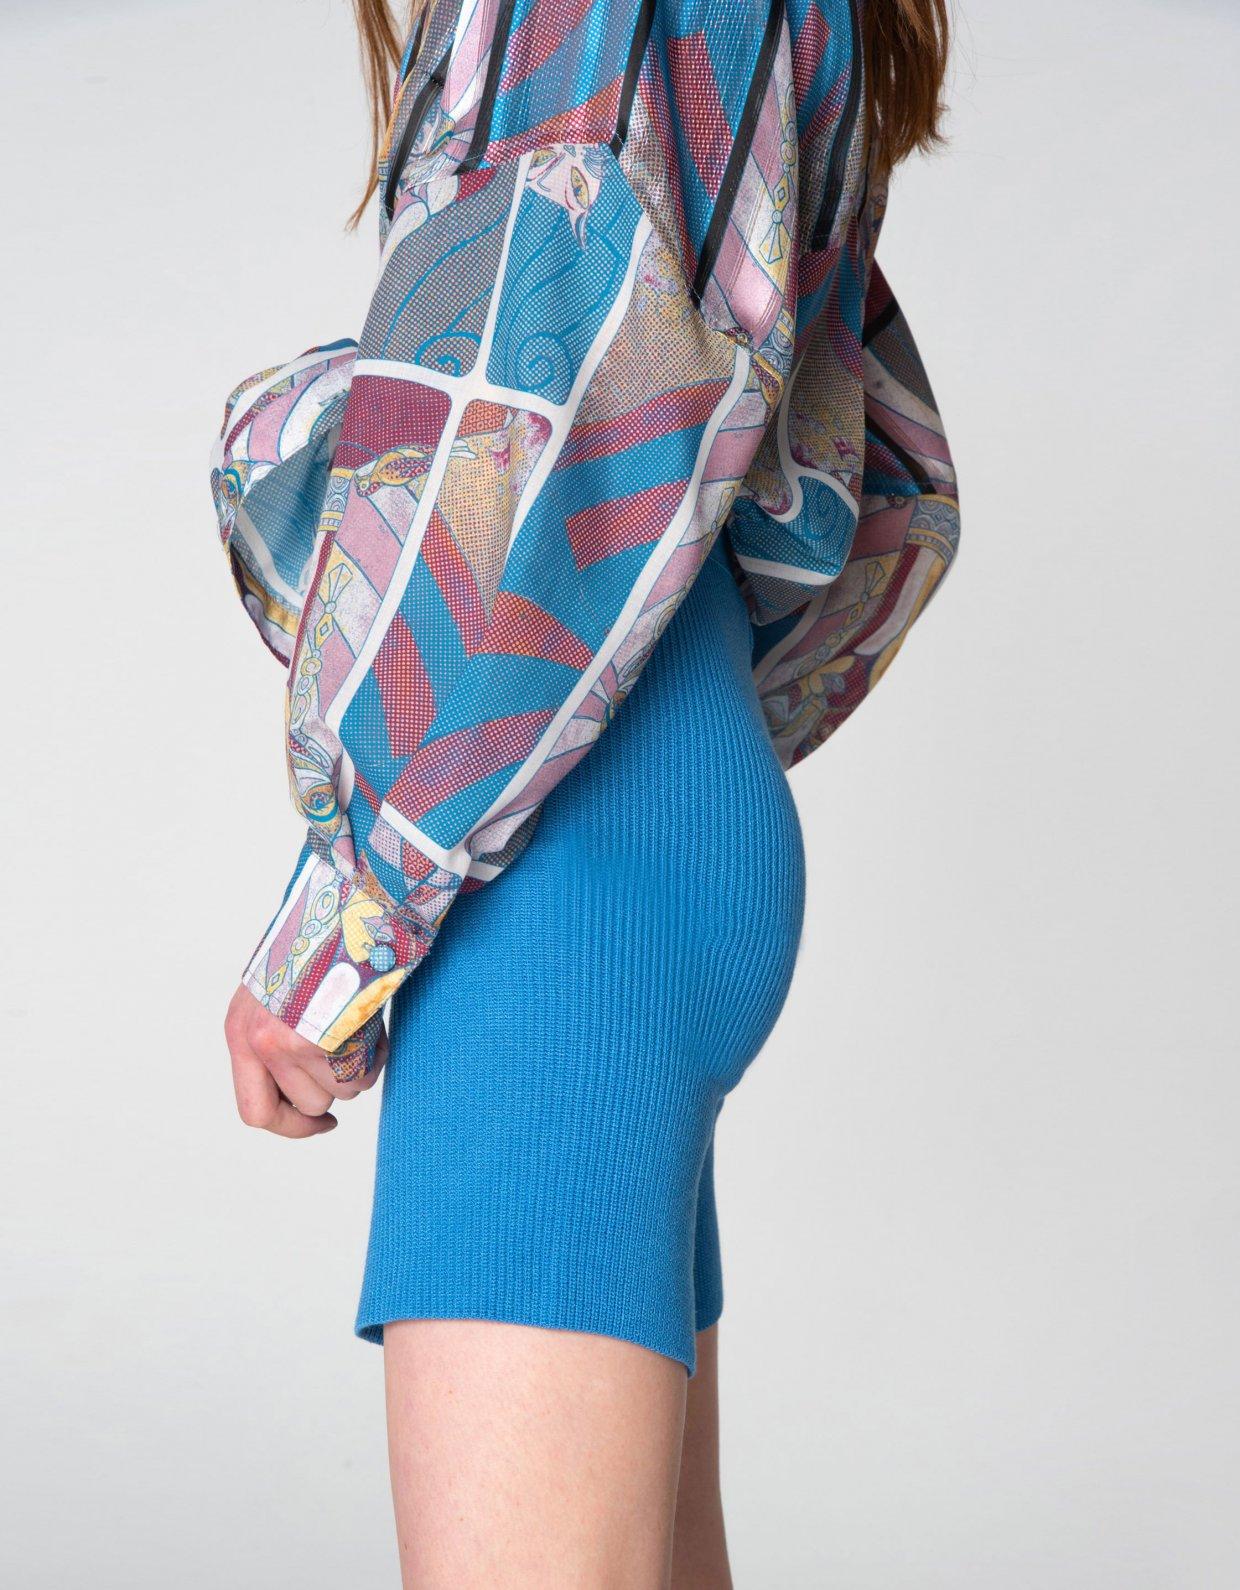 Nadia Rapti Tribes of knit leggings turquoise